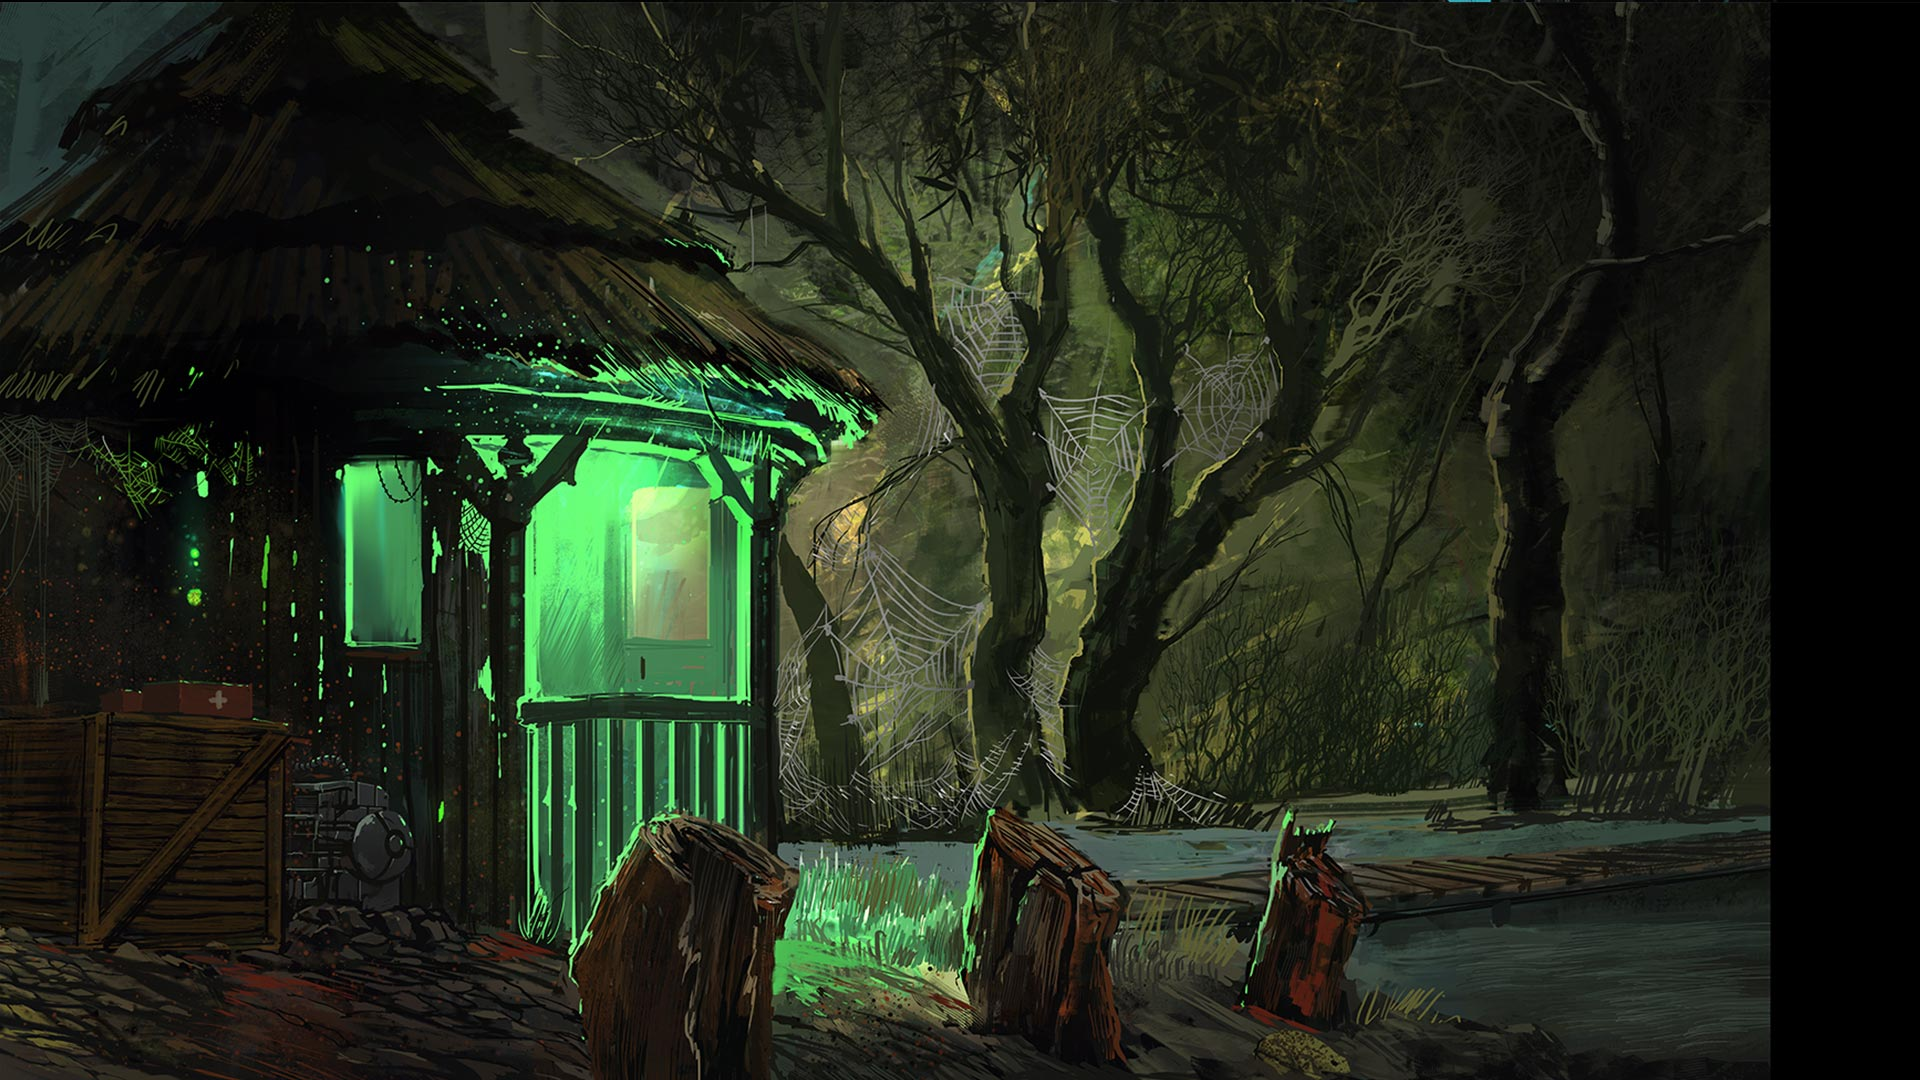 Beautiful Quotes Wallpapers For Mobile Dark Woods Hd Backgrounds Pixelstalk Net